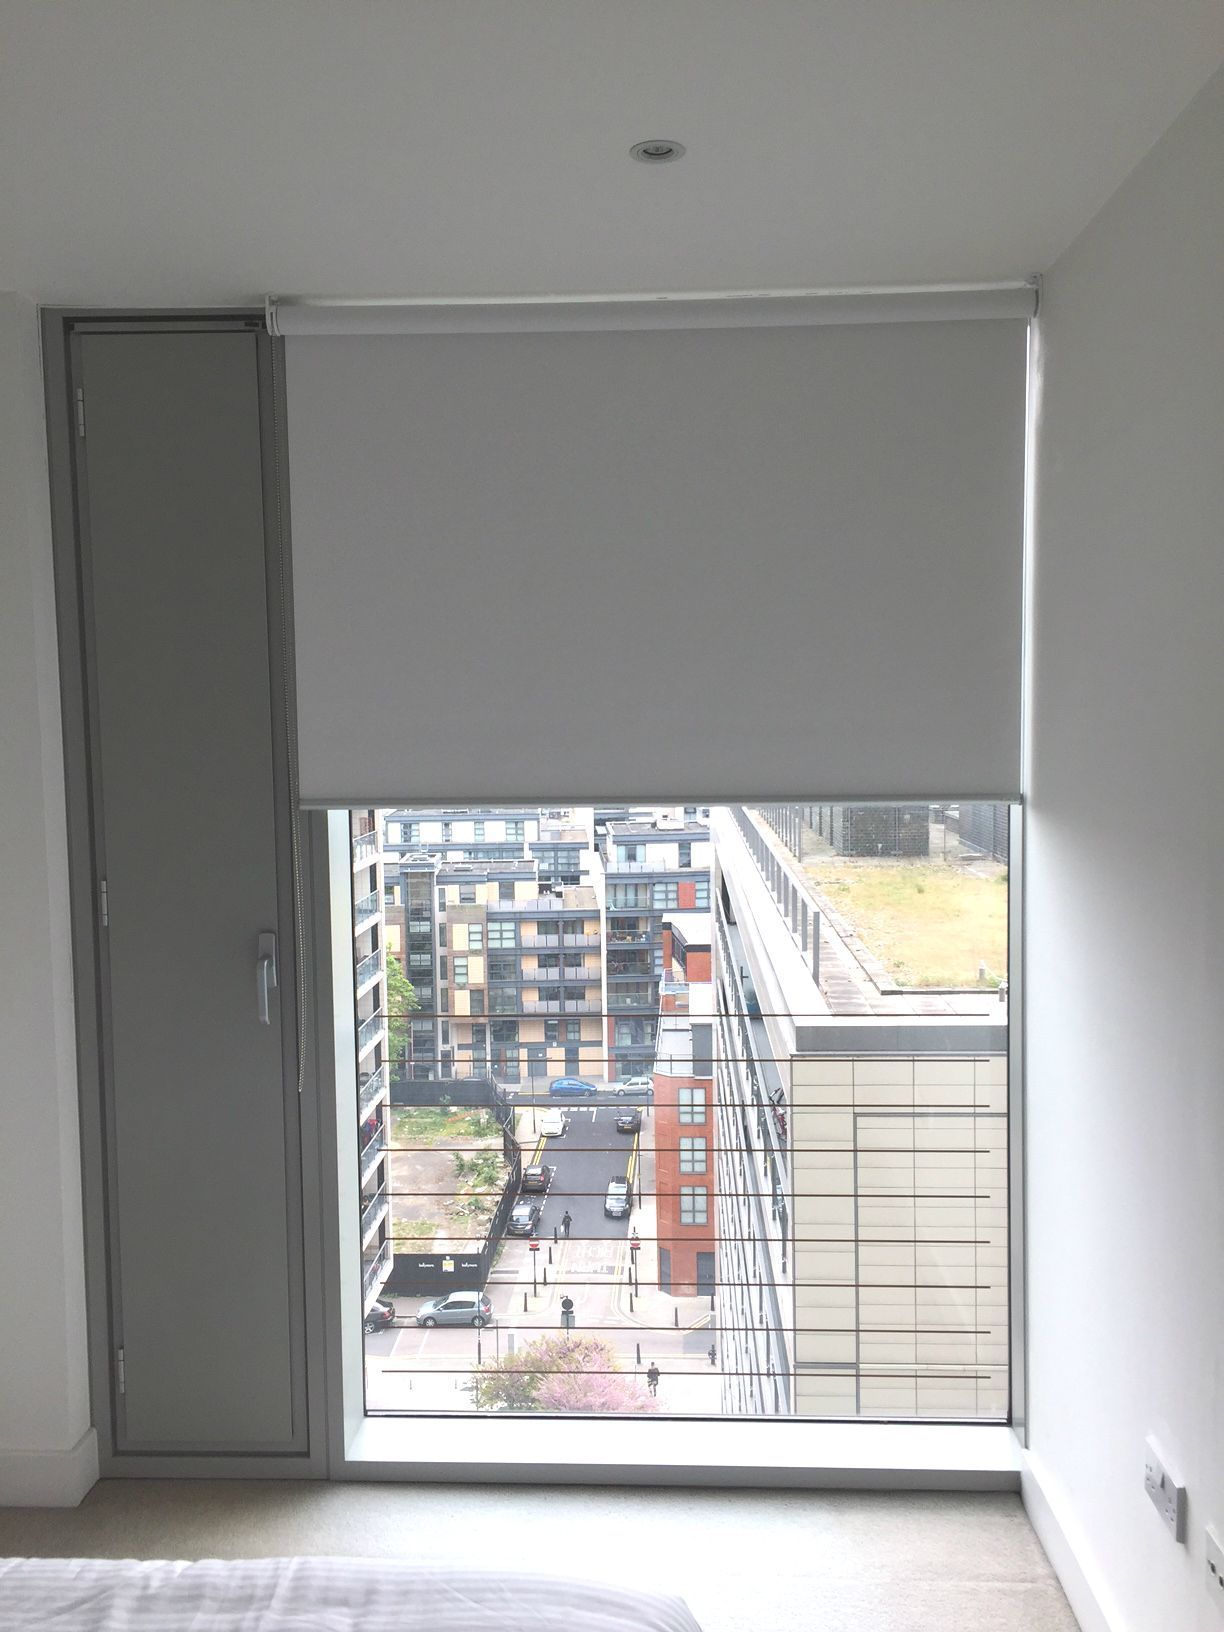 Blackout Roller Blind For Floor To Ceiling Window Bedroom Blind 22 Marsh Wall Landmark Tower Blinds For Windows Living Room Blinds Vertical Window Blinds